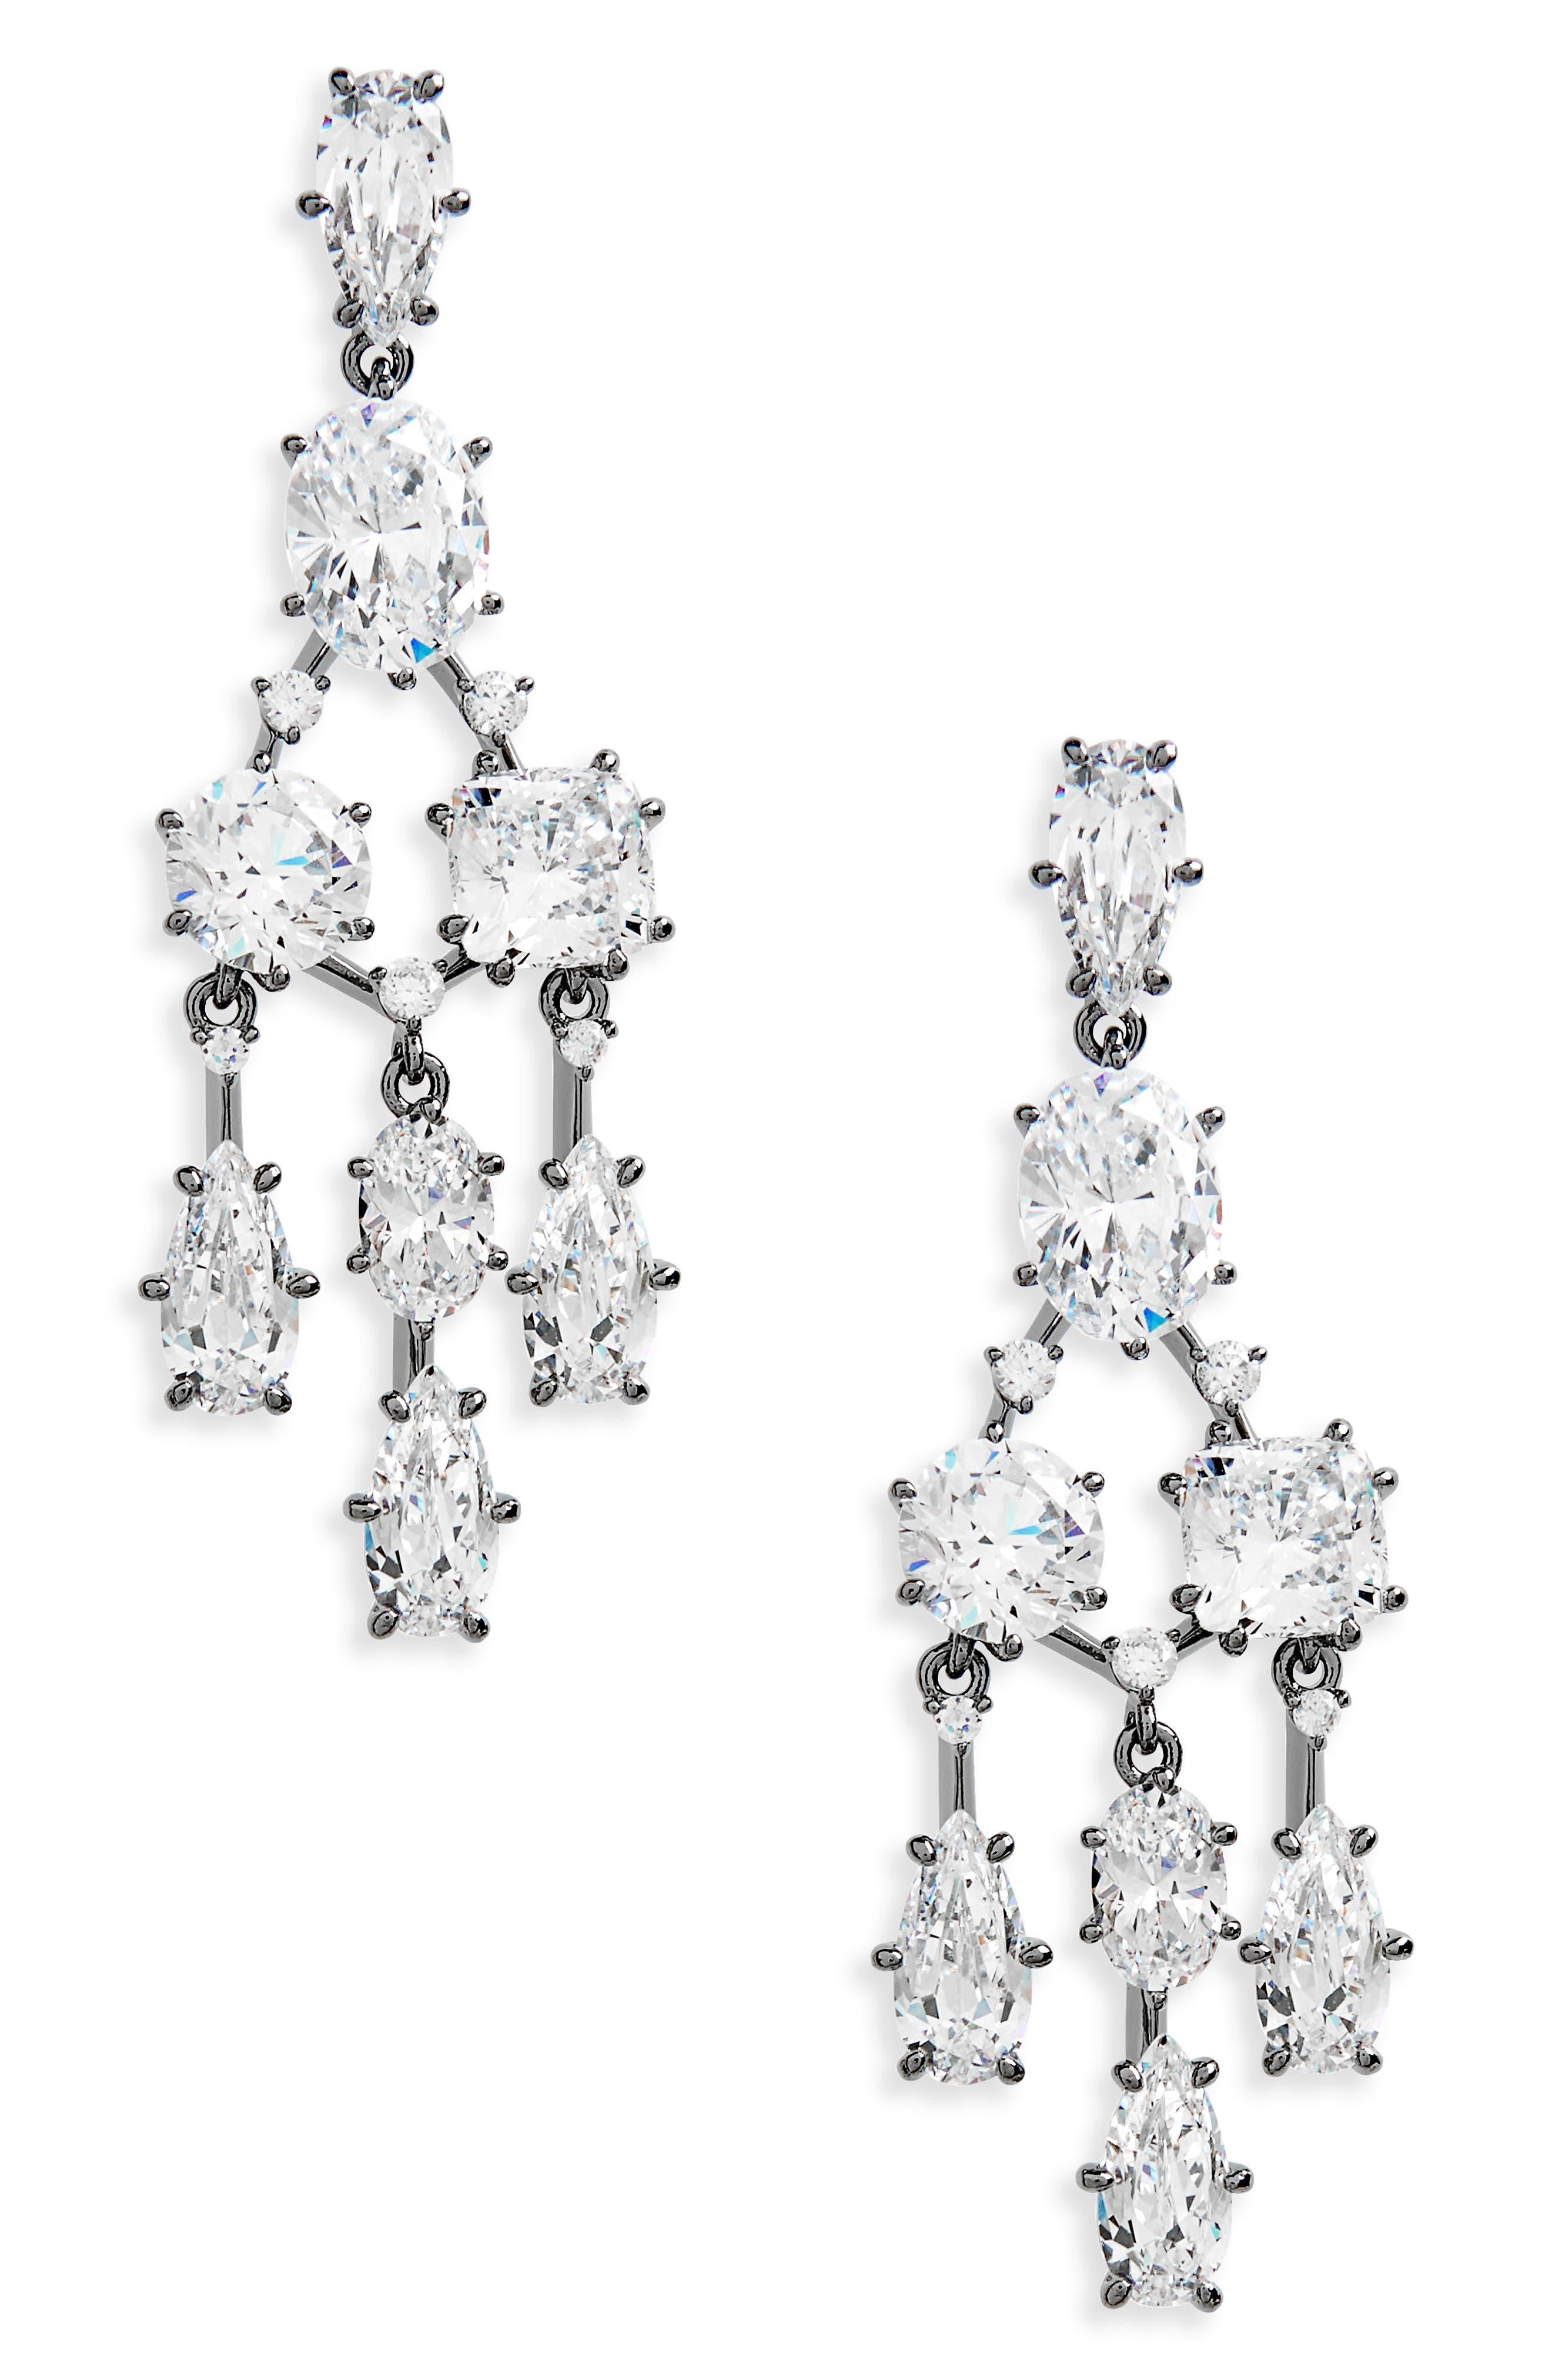 Cubic Zirconia Chandelier Earrings,                             Main thumbnail 1, color,                             001